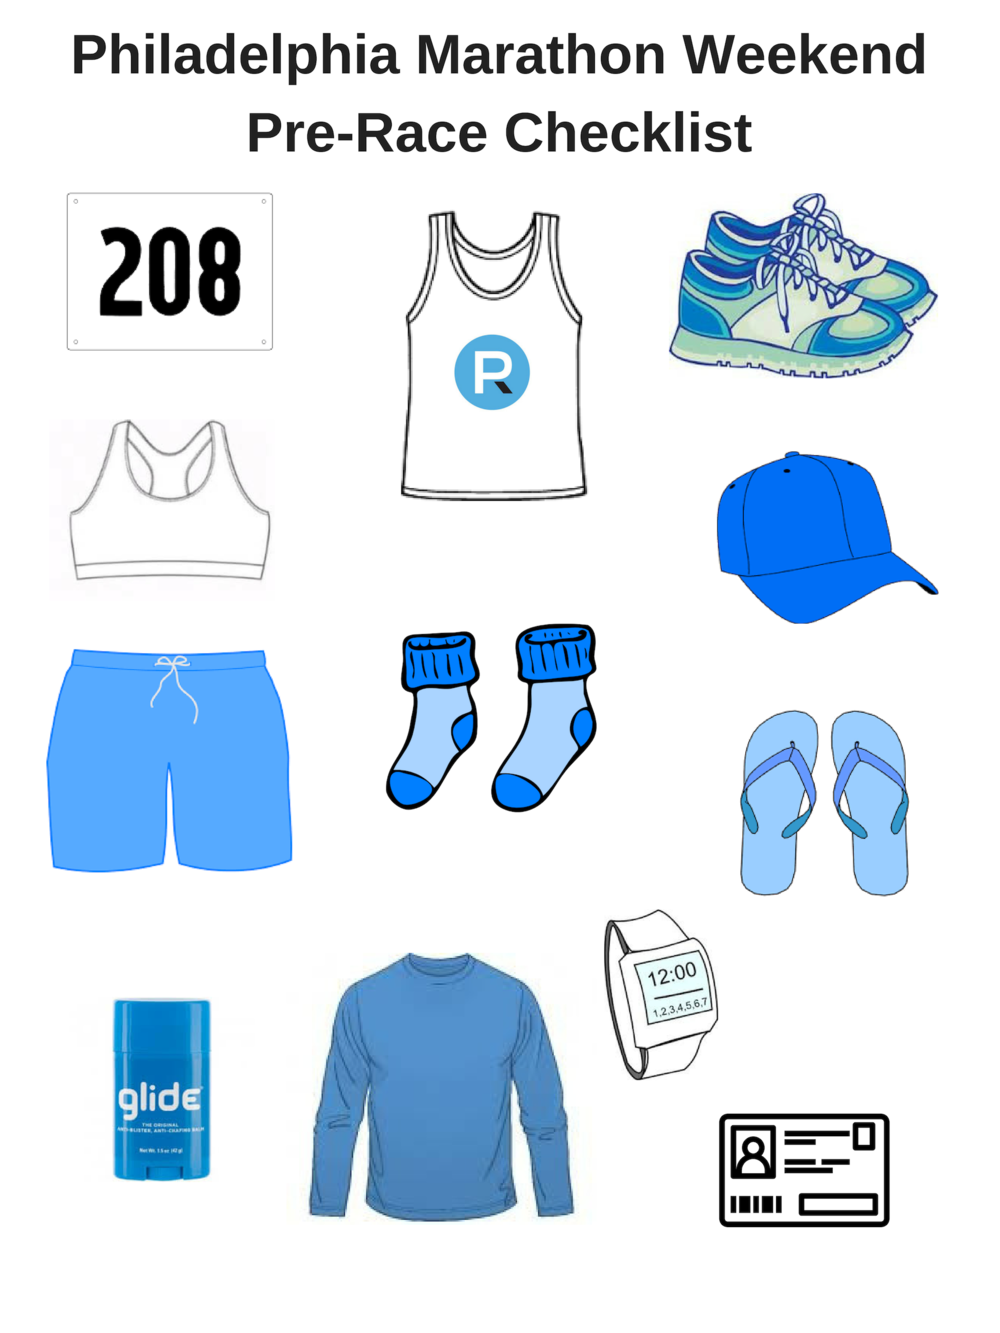 Pre-Race Checklist.png